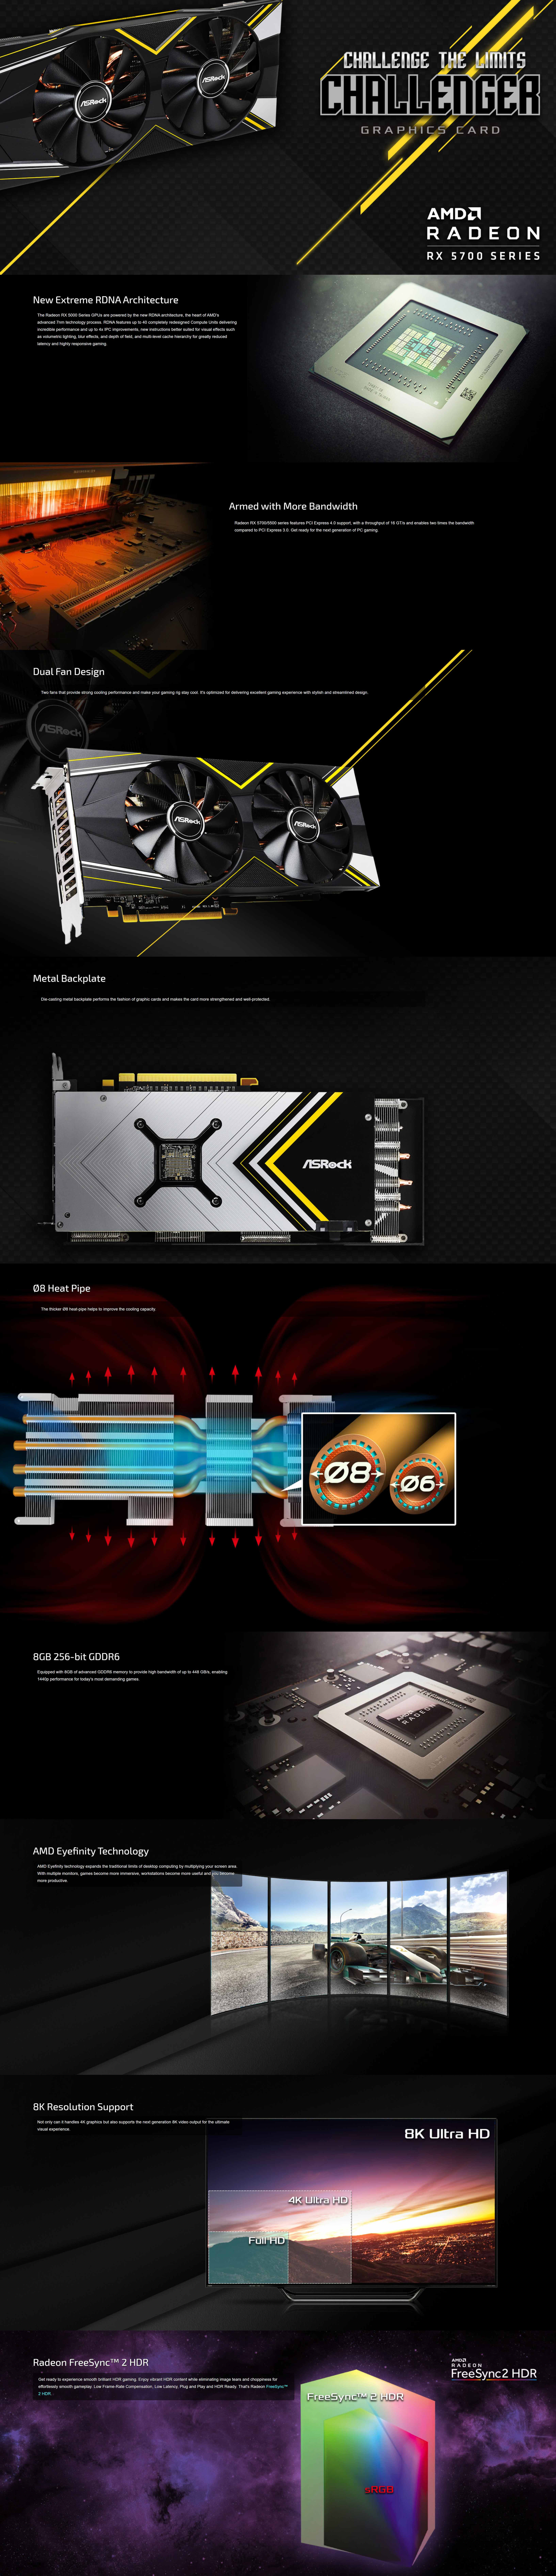 screencapture-asrock-Graphics-Card-AMD-Radeon-RX-5700-XT-Challenger-D-8G-OC-2019-12-27-10_16_39.jpg